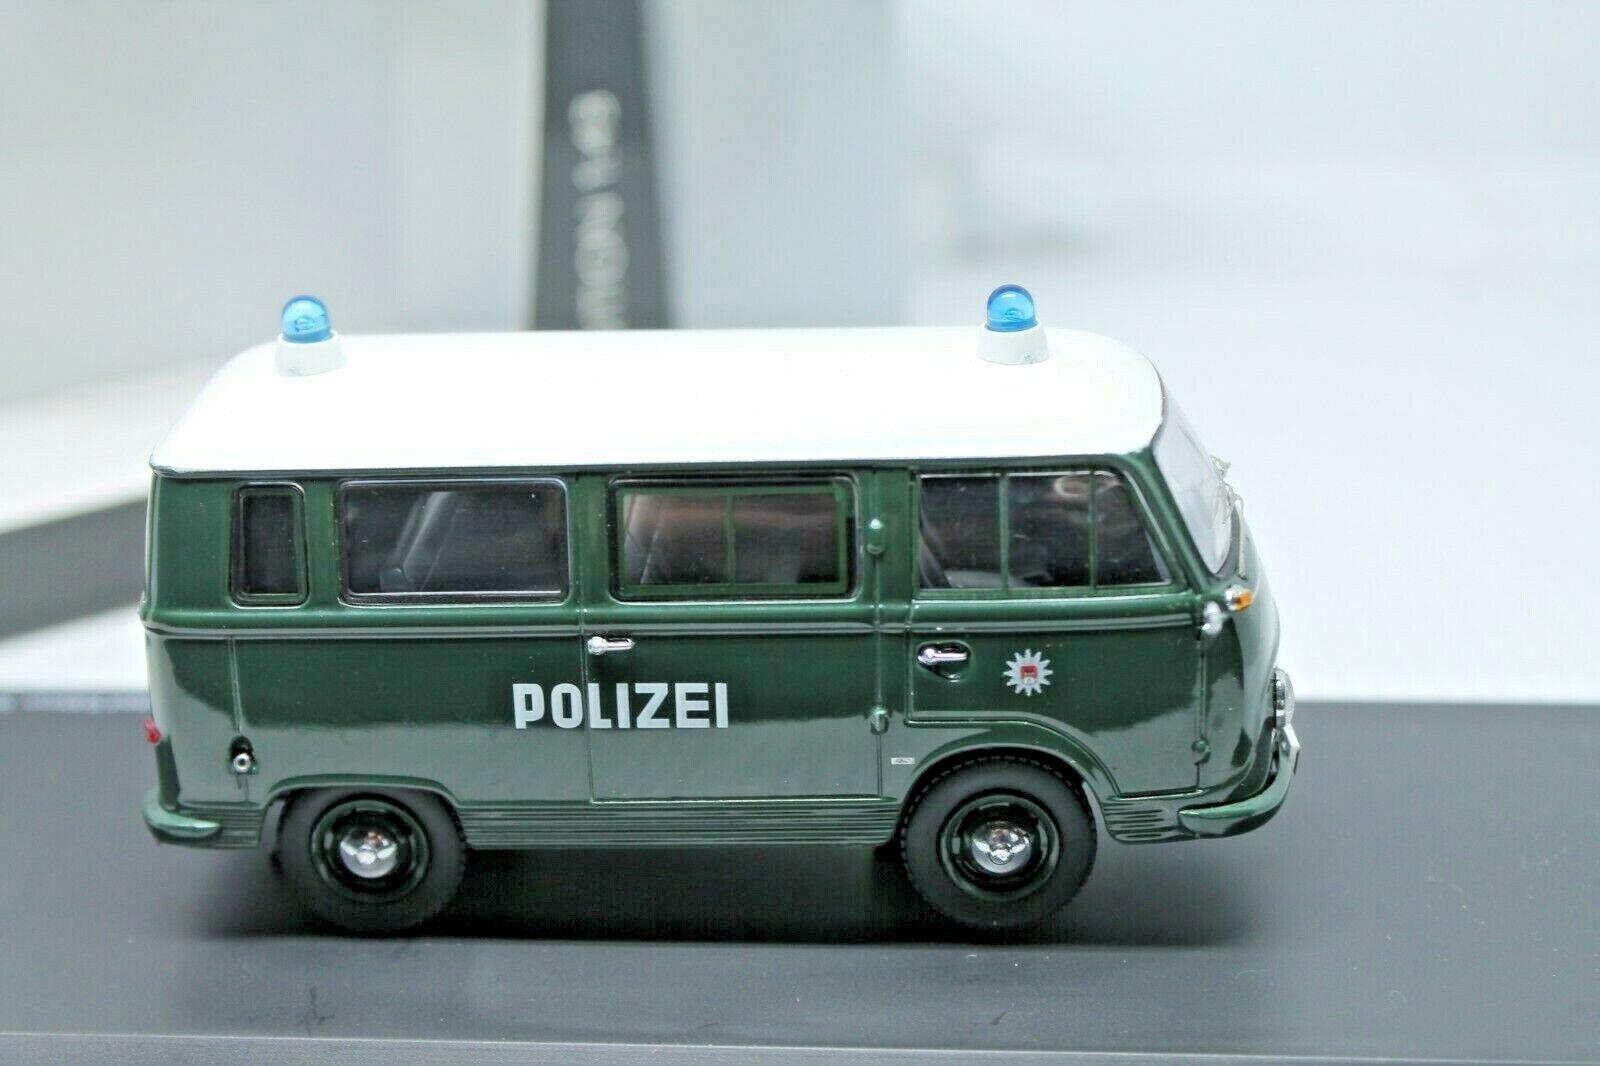 ¡envío gratis! Schuco  ford transit transit transit 1000  policía Hamburgo  1 43  OVP  Centro comercial profesional integrado en línea.